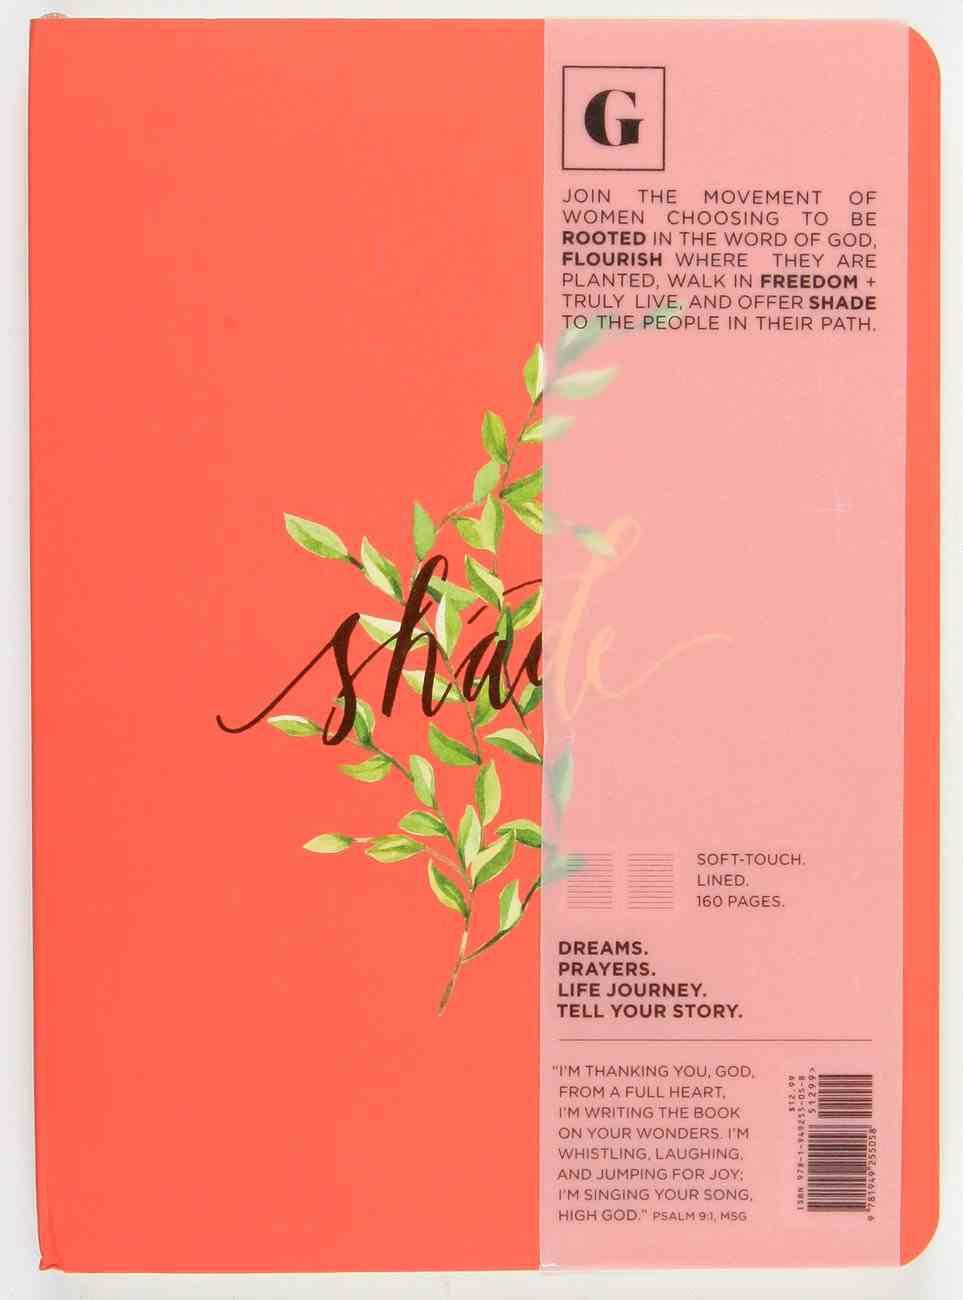 The Grove Journal (Orange) Imitation Leather